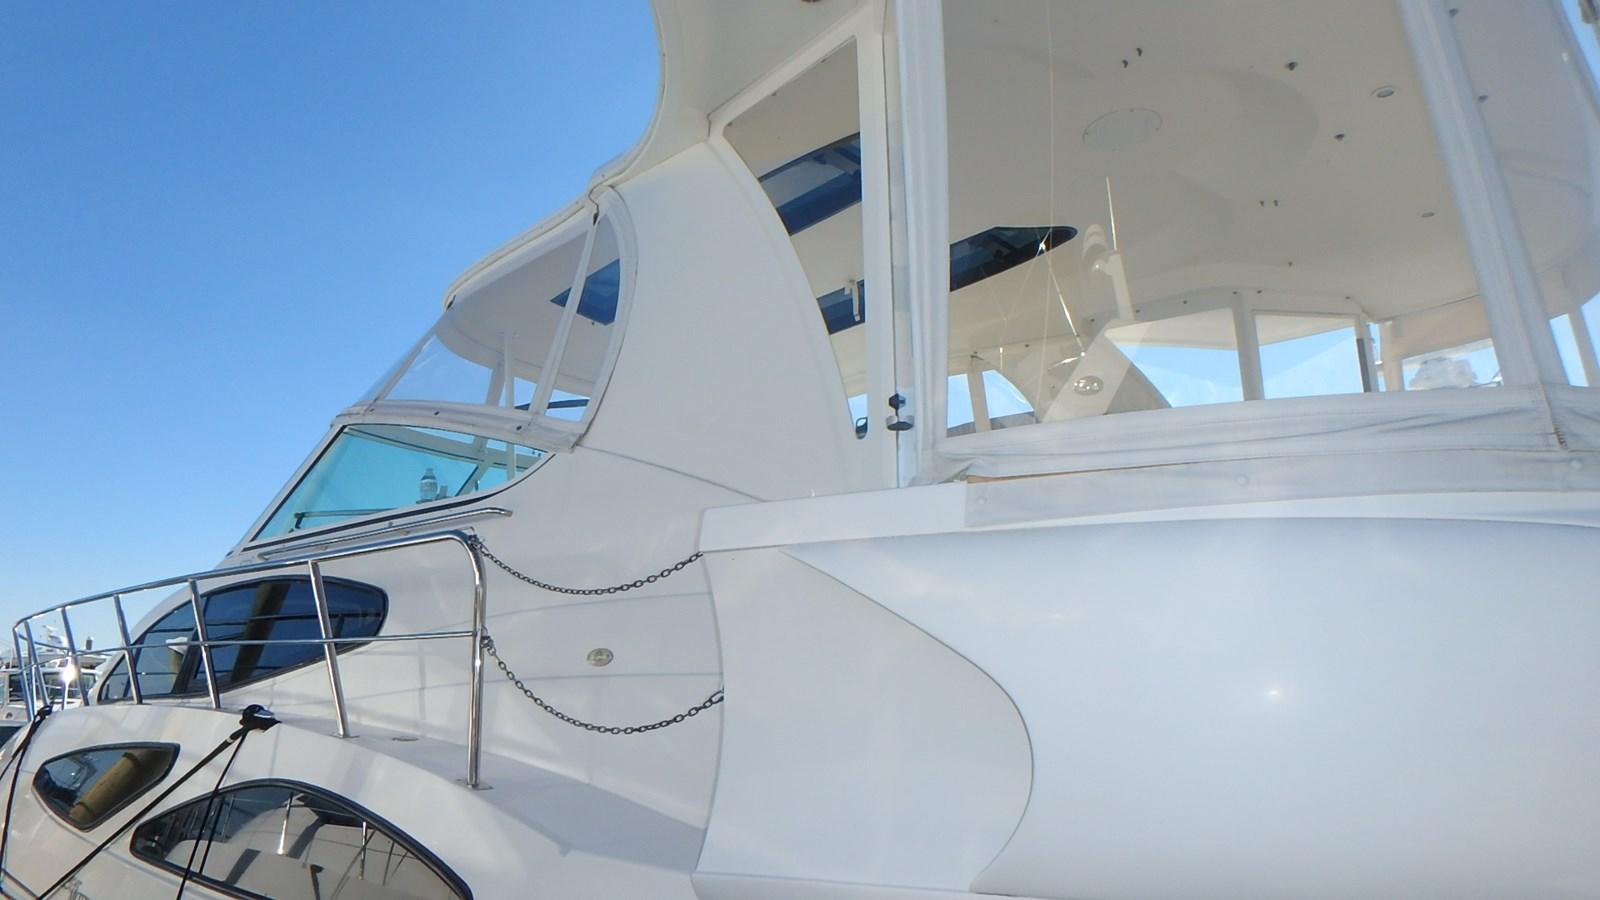 P1160914 2005 CRUISERS YACHTS 455 Express Motoryacht Motor Yacht 2522140